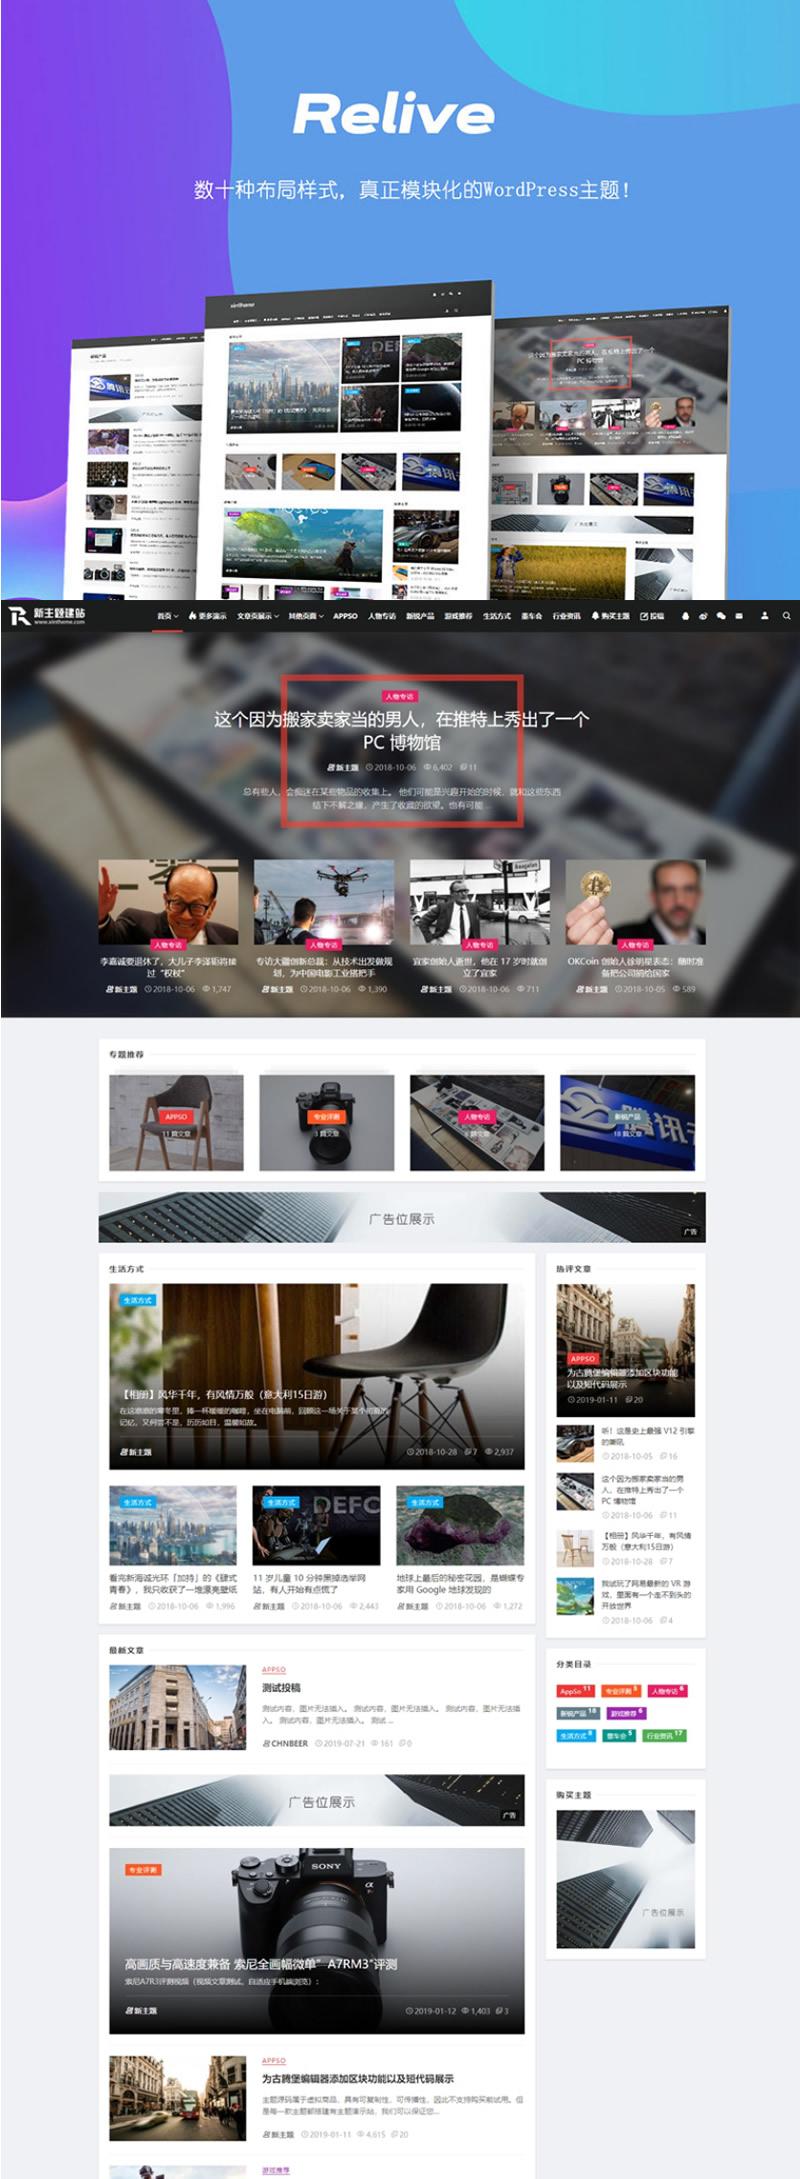 WordPress主题 Relive 3.1自媒体博客主题模板插图